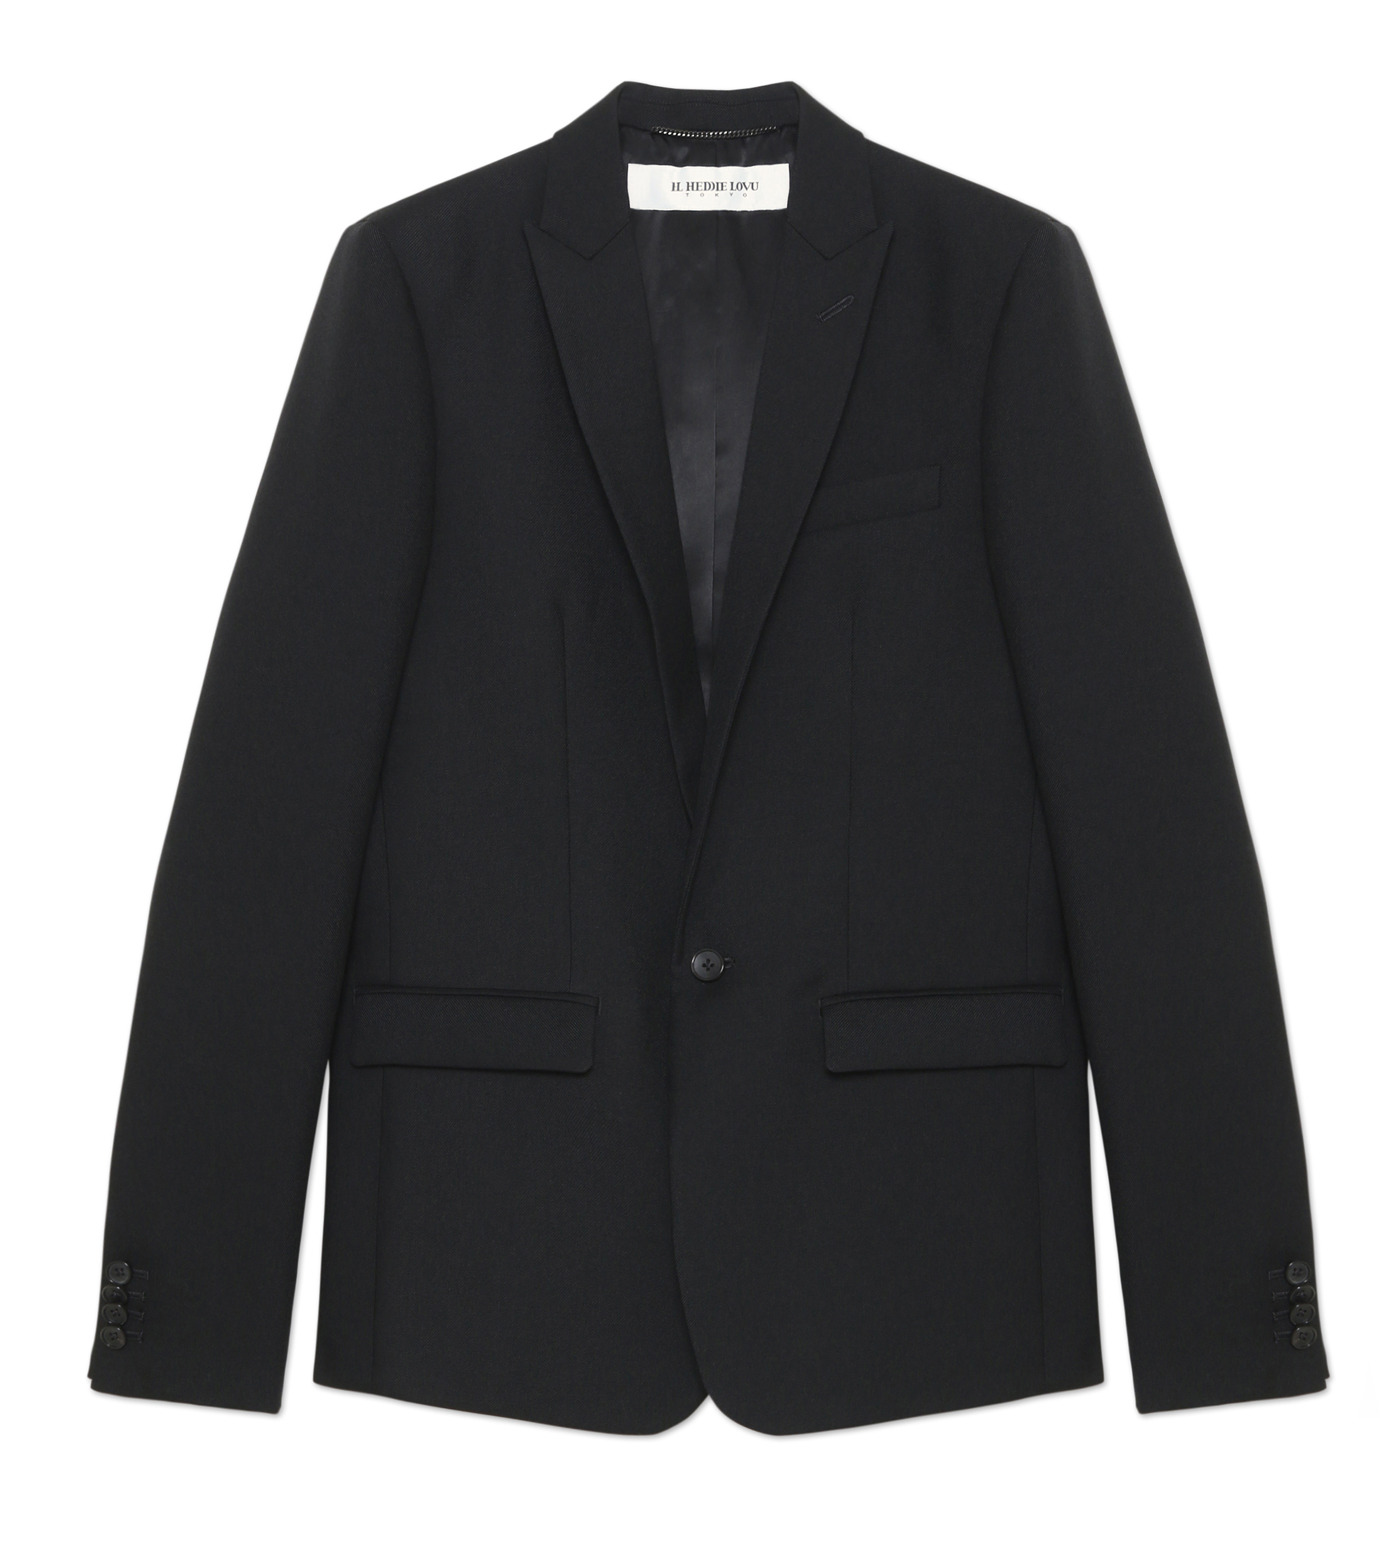 HL HEDDIE LOVU(エイチエル・エディールーヴ)のPEAKED LAPEL 1B JK-BLACK(ジャケット/jacket)-18S94005-13 拡大詳細画像4